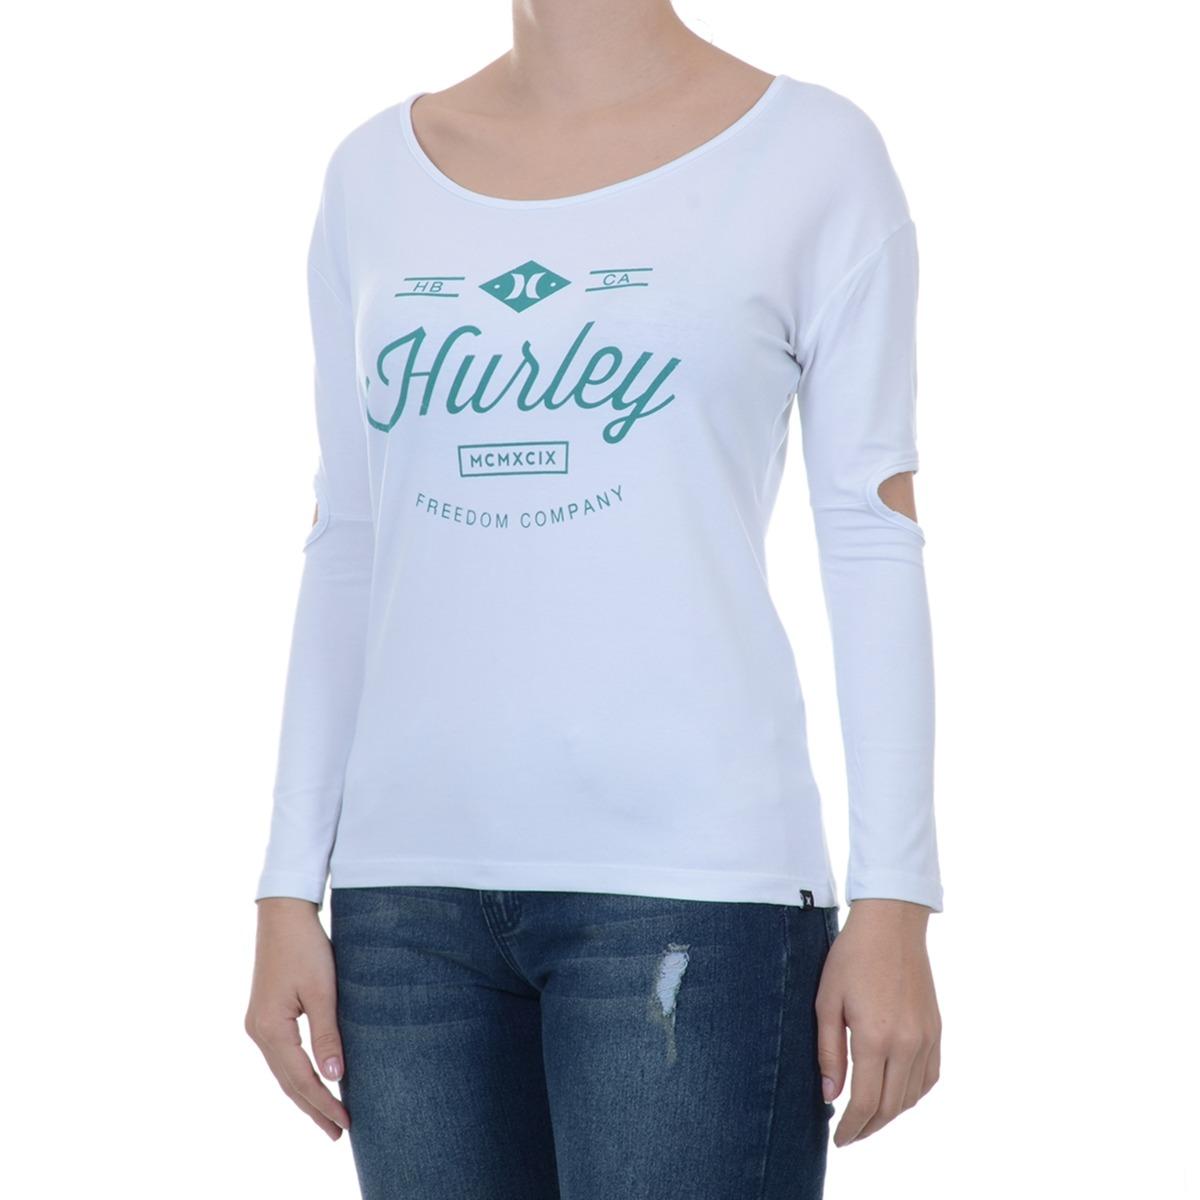 blusa feminina hurley freedom. Carregando zoom. cedc6baf637